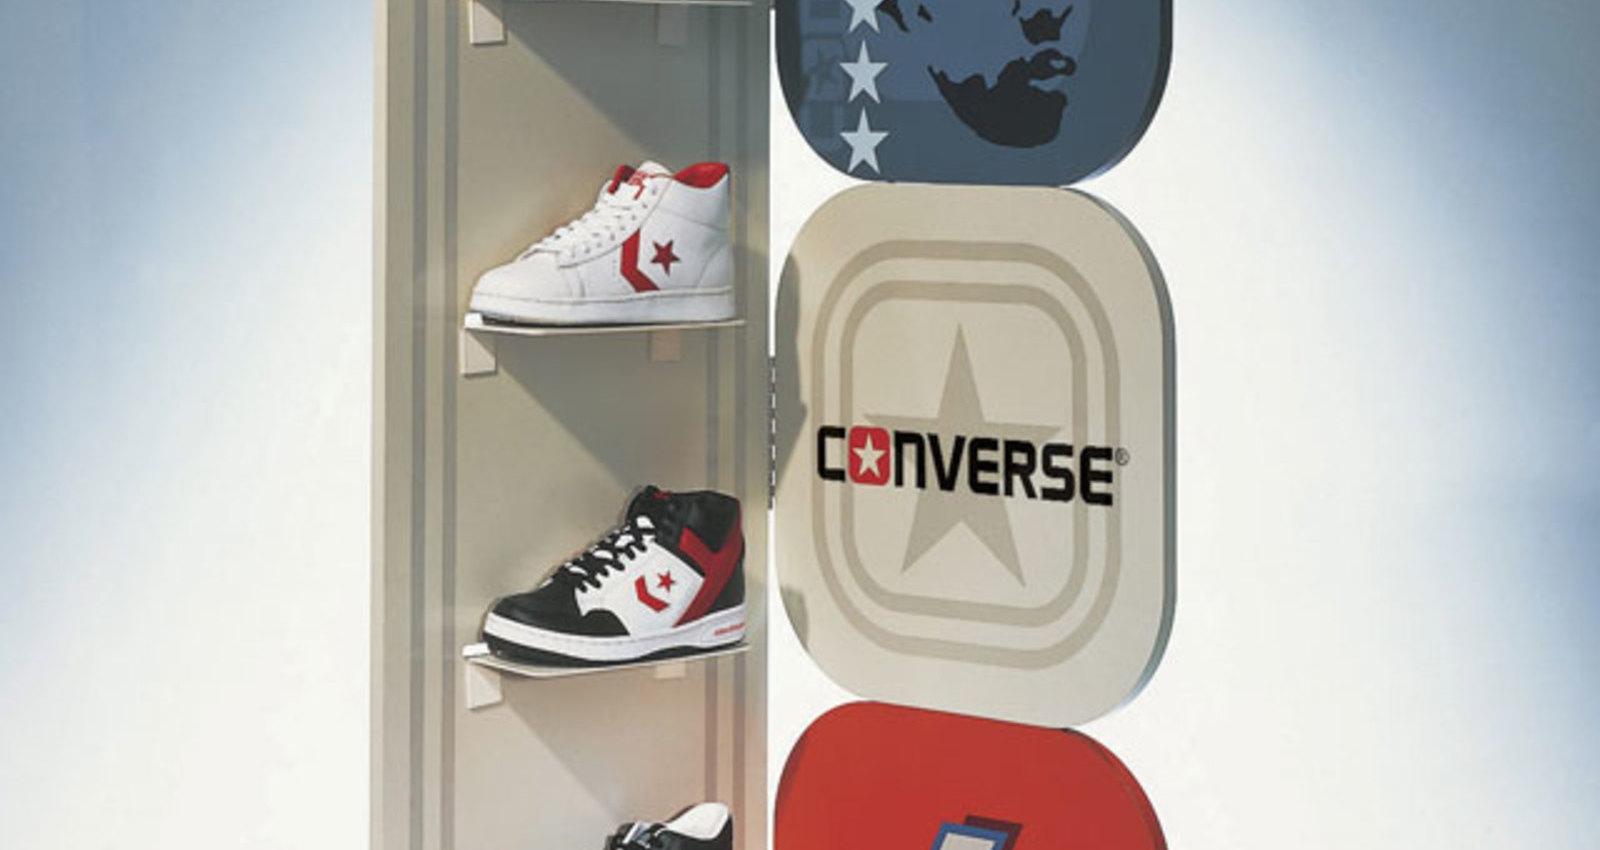 Converse Dr. J POS